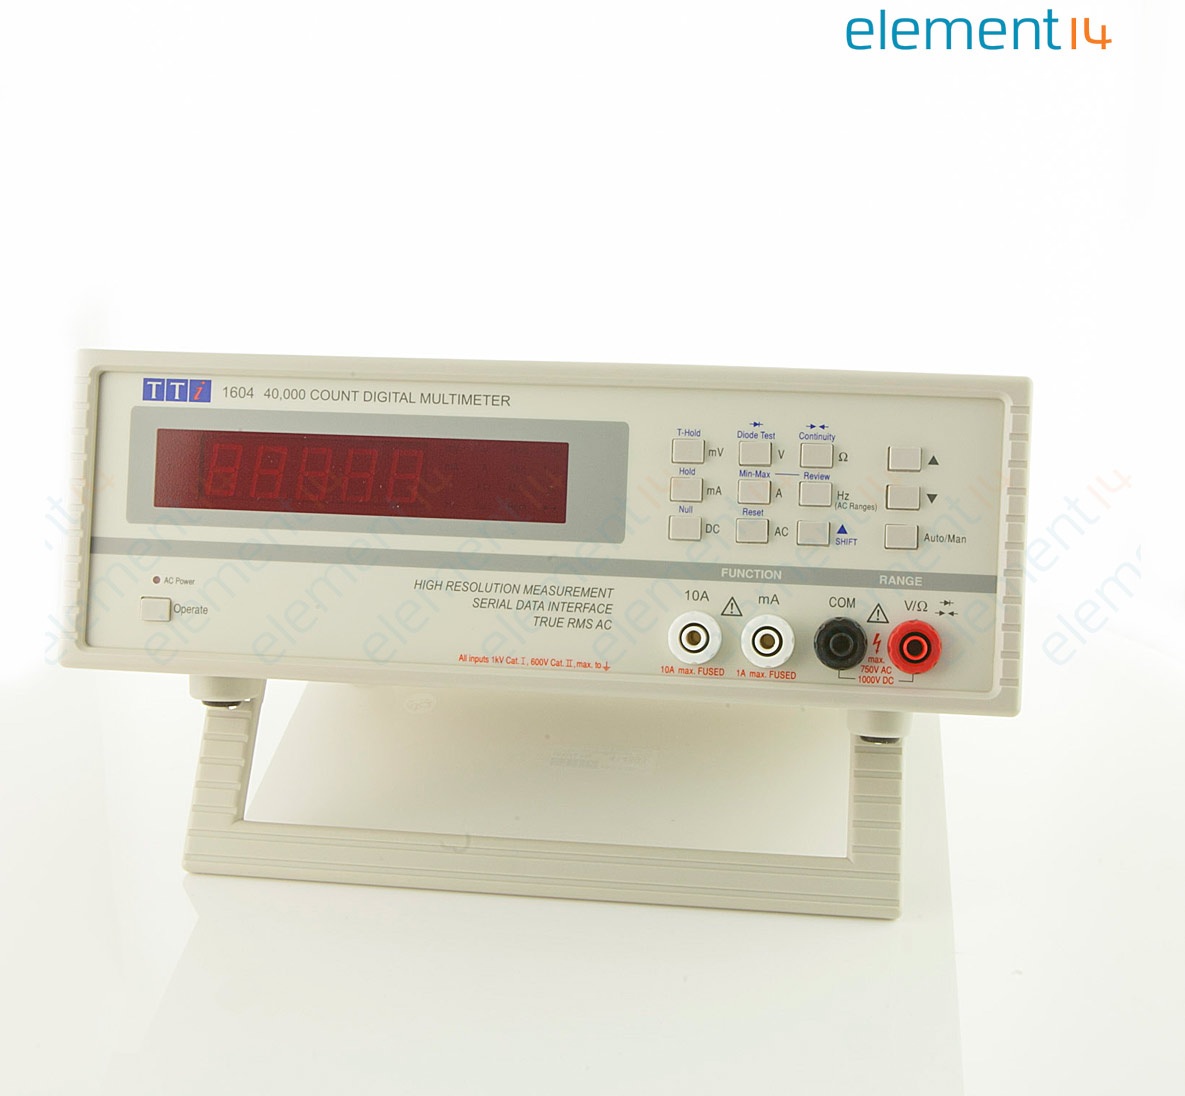 Dmm1604 Aim Tti Instruments Bench Digital Multimeter 1604 Series Digtal Led Voltmeter Circuit Diagram Tradeoficcom Add To Compare